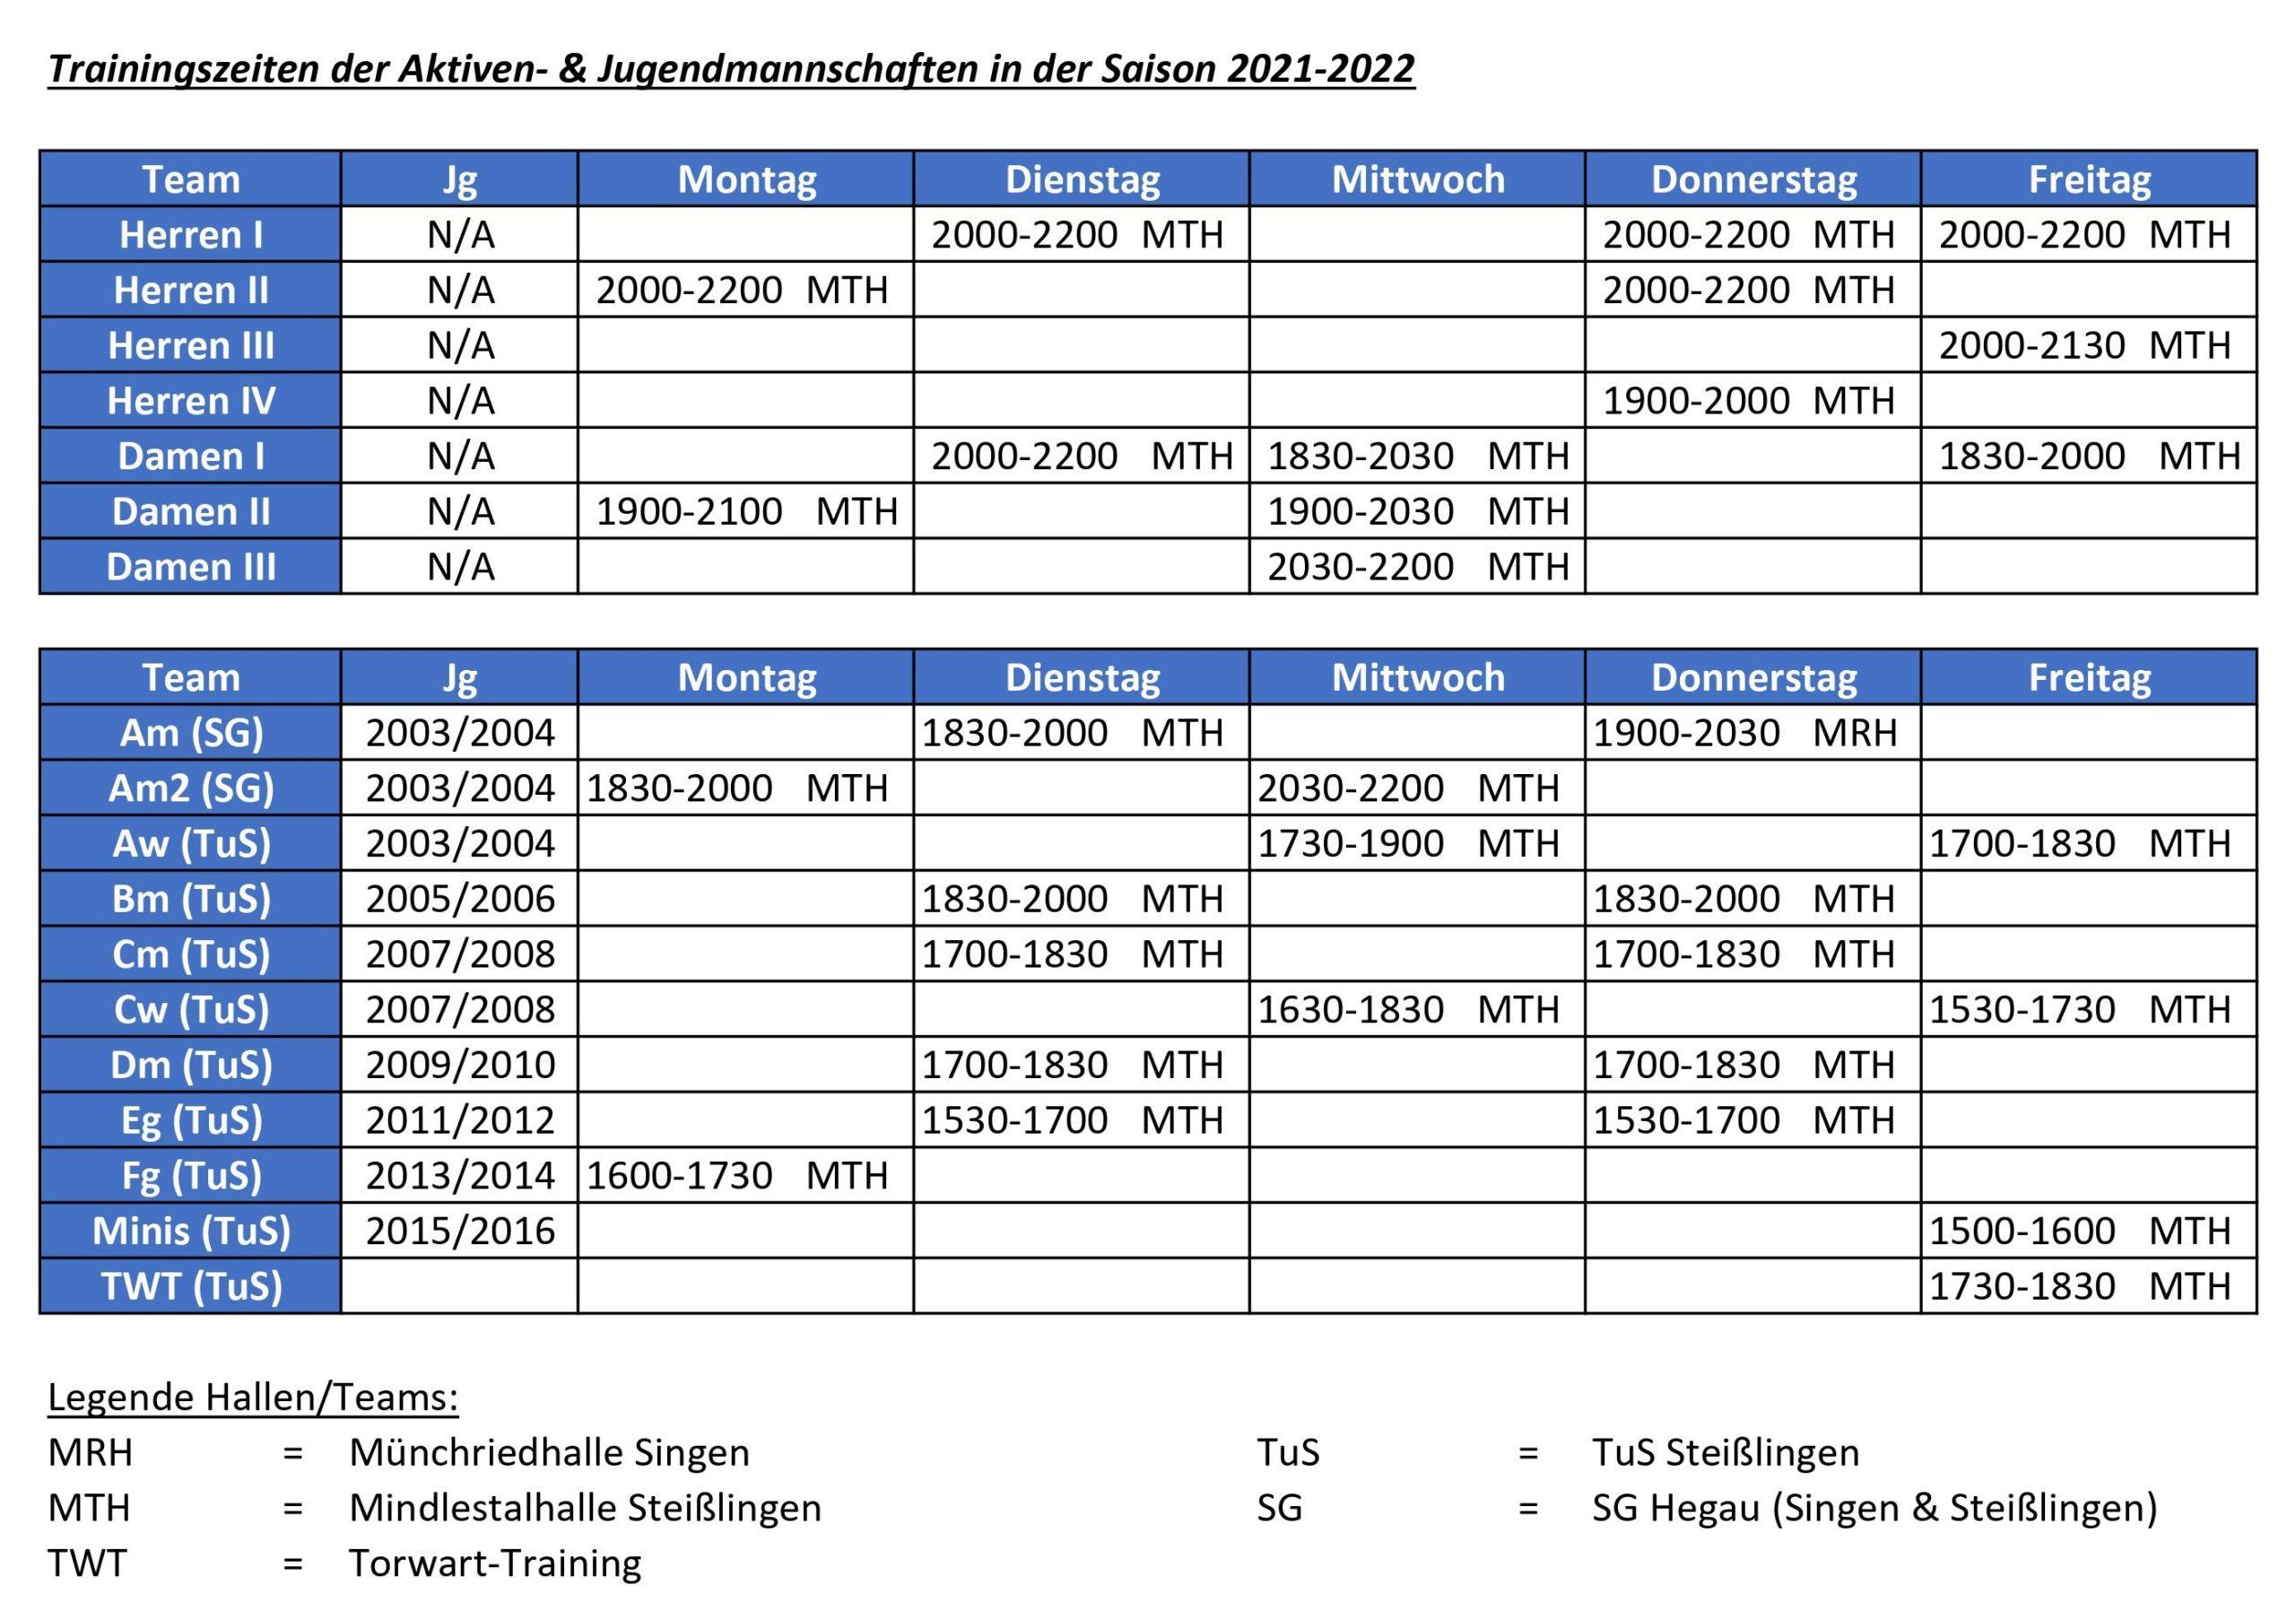 Trainingszeiten Aktive & Jugend